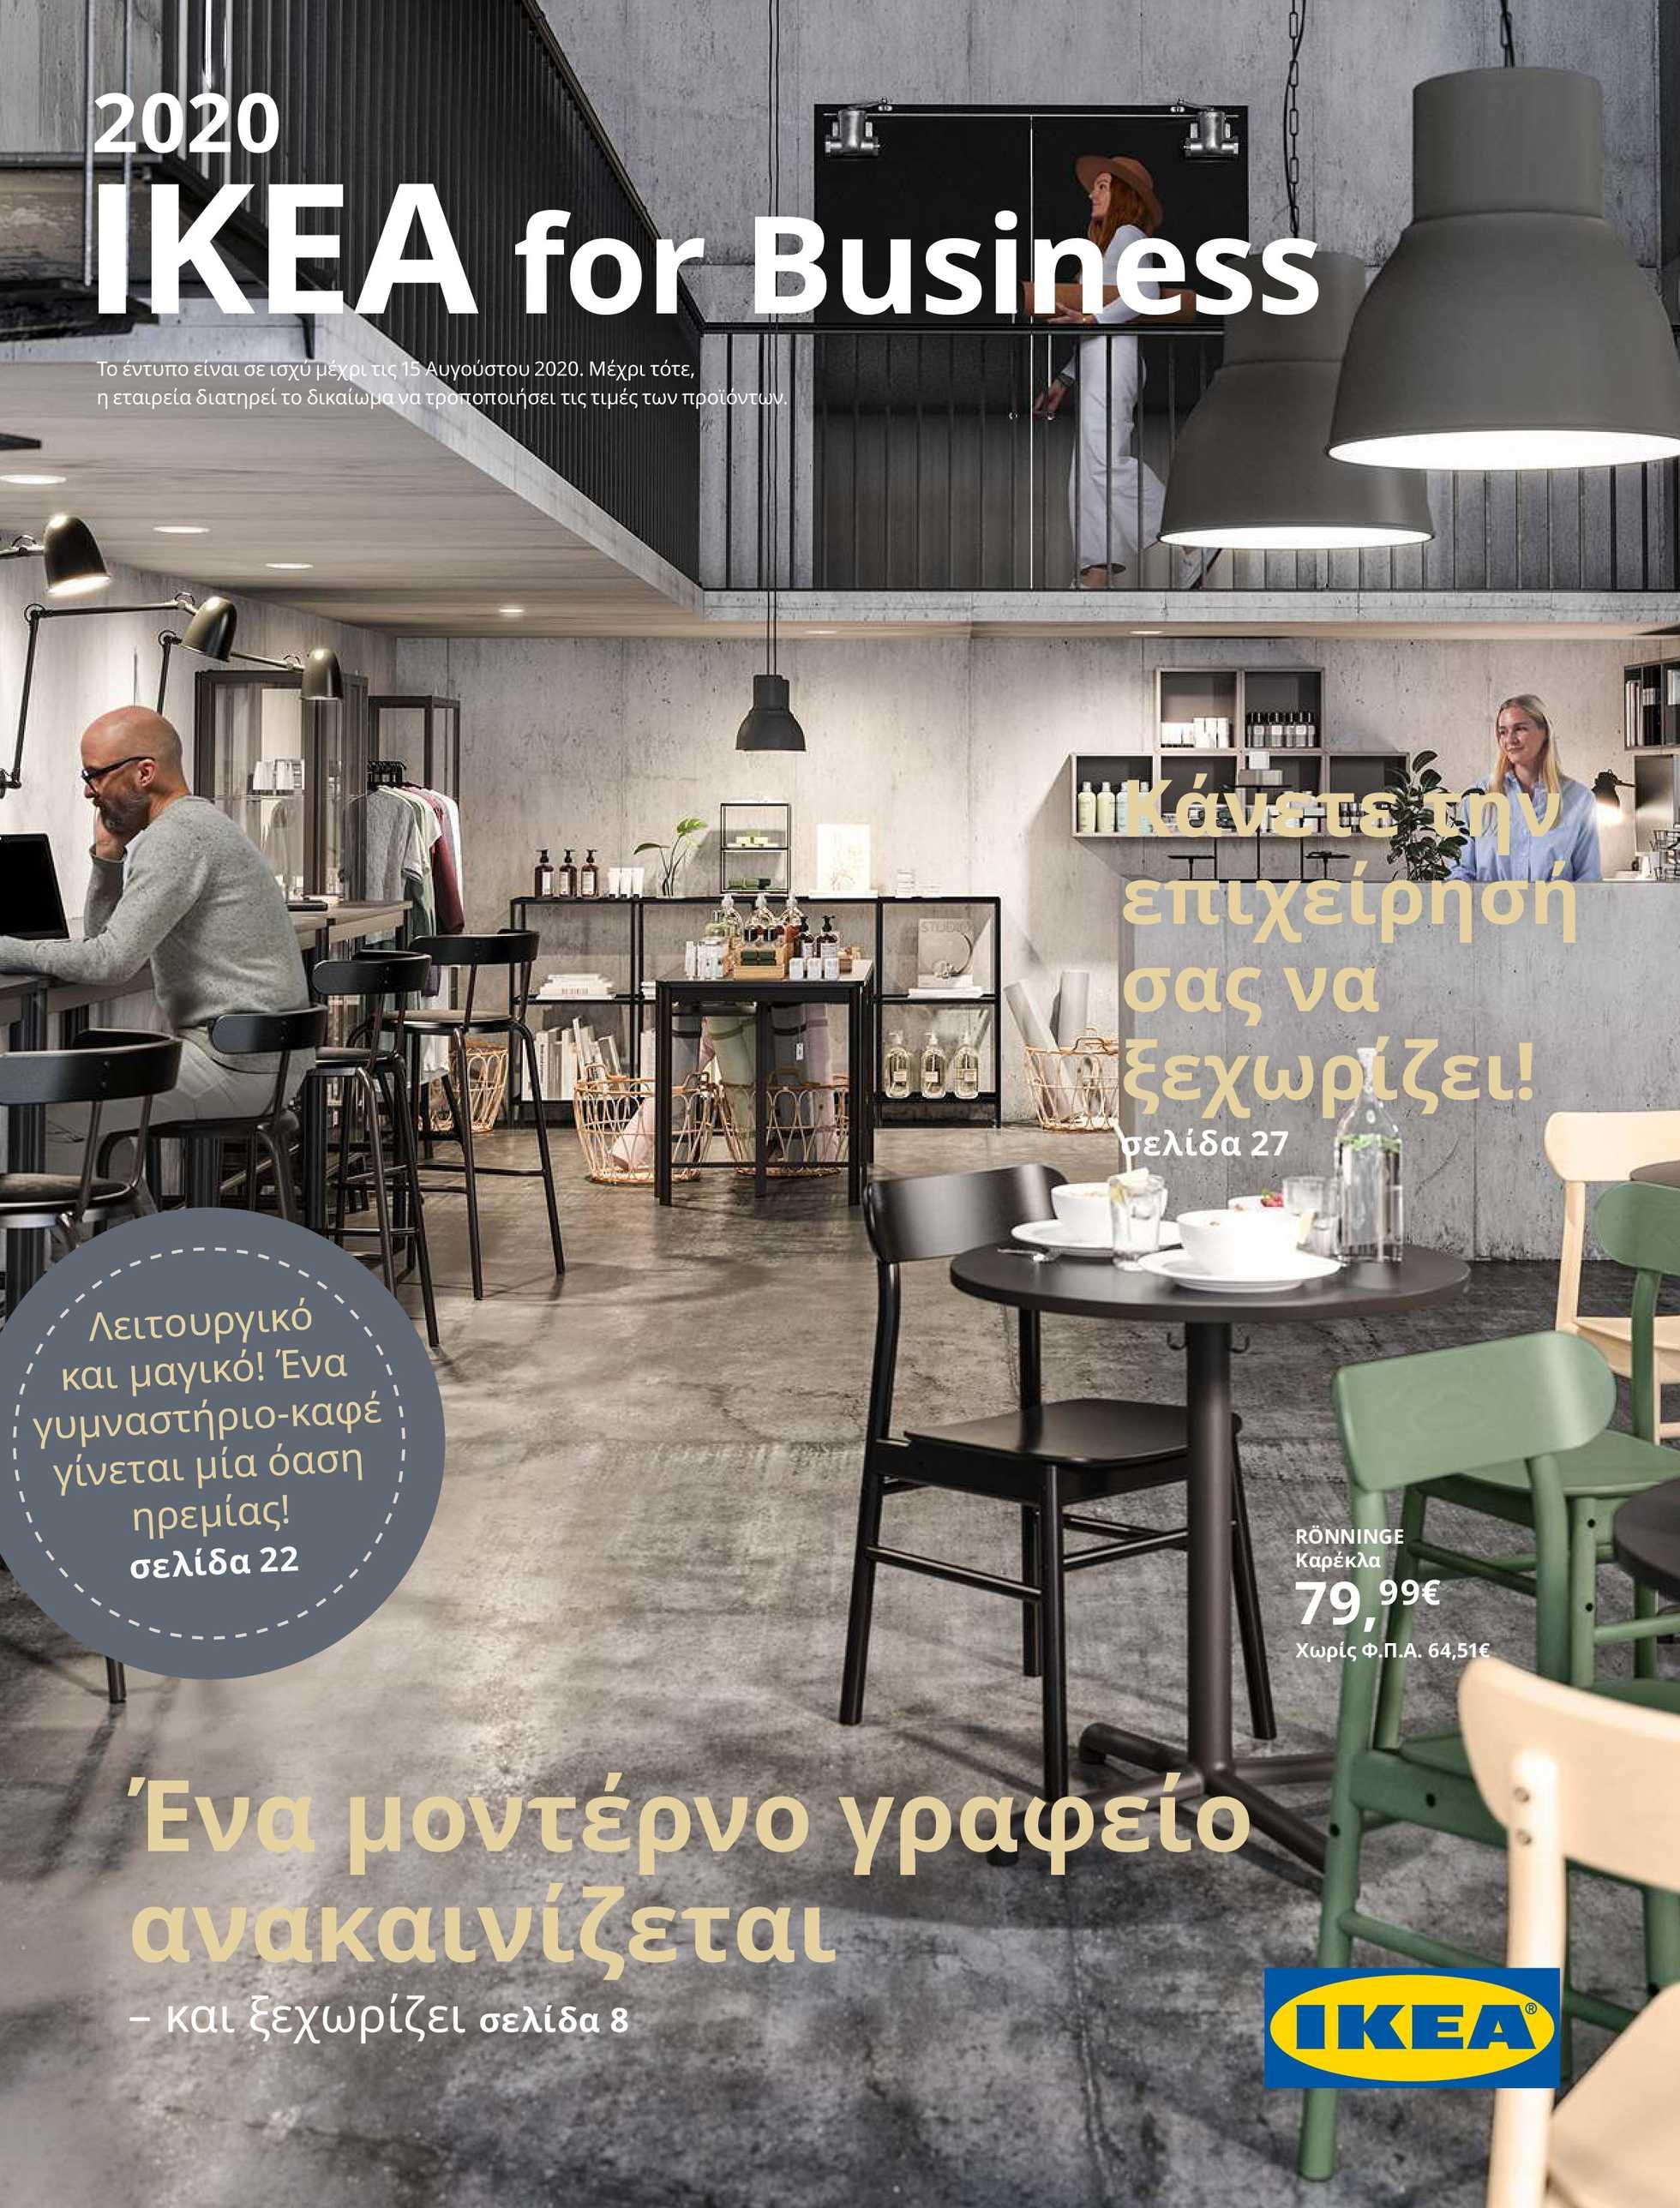 IKEA - η προσφορά ισχύει από 01.01.2020 μέχρι 15.08.2020 - σελίδα 1.